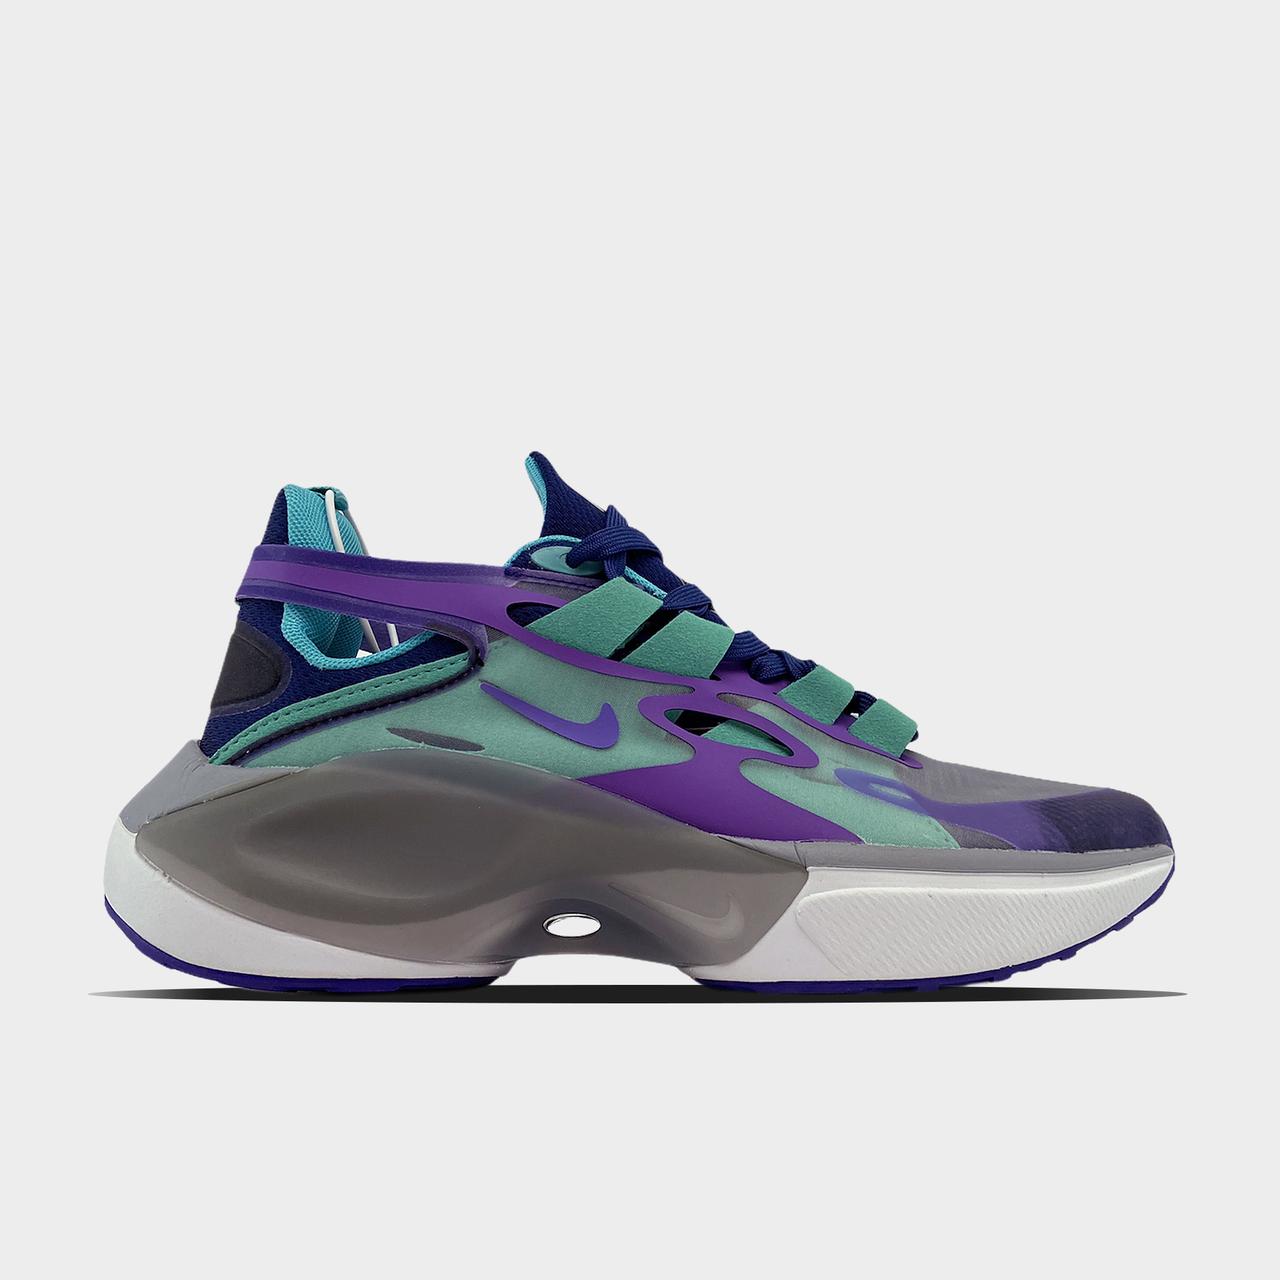 Nk, крос, обувь, взуття, sneakers, шузы, Signal D Purple Blue (Фиолетовый)